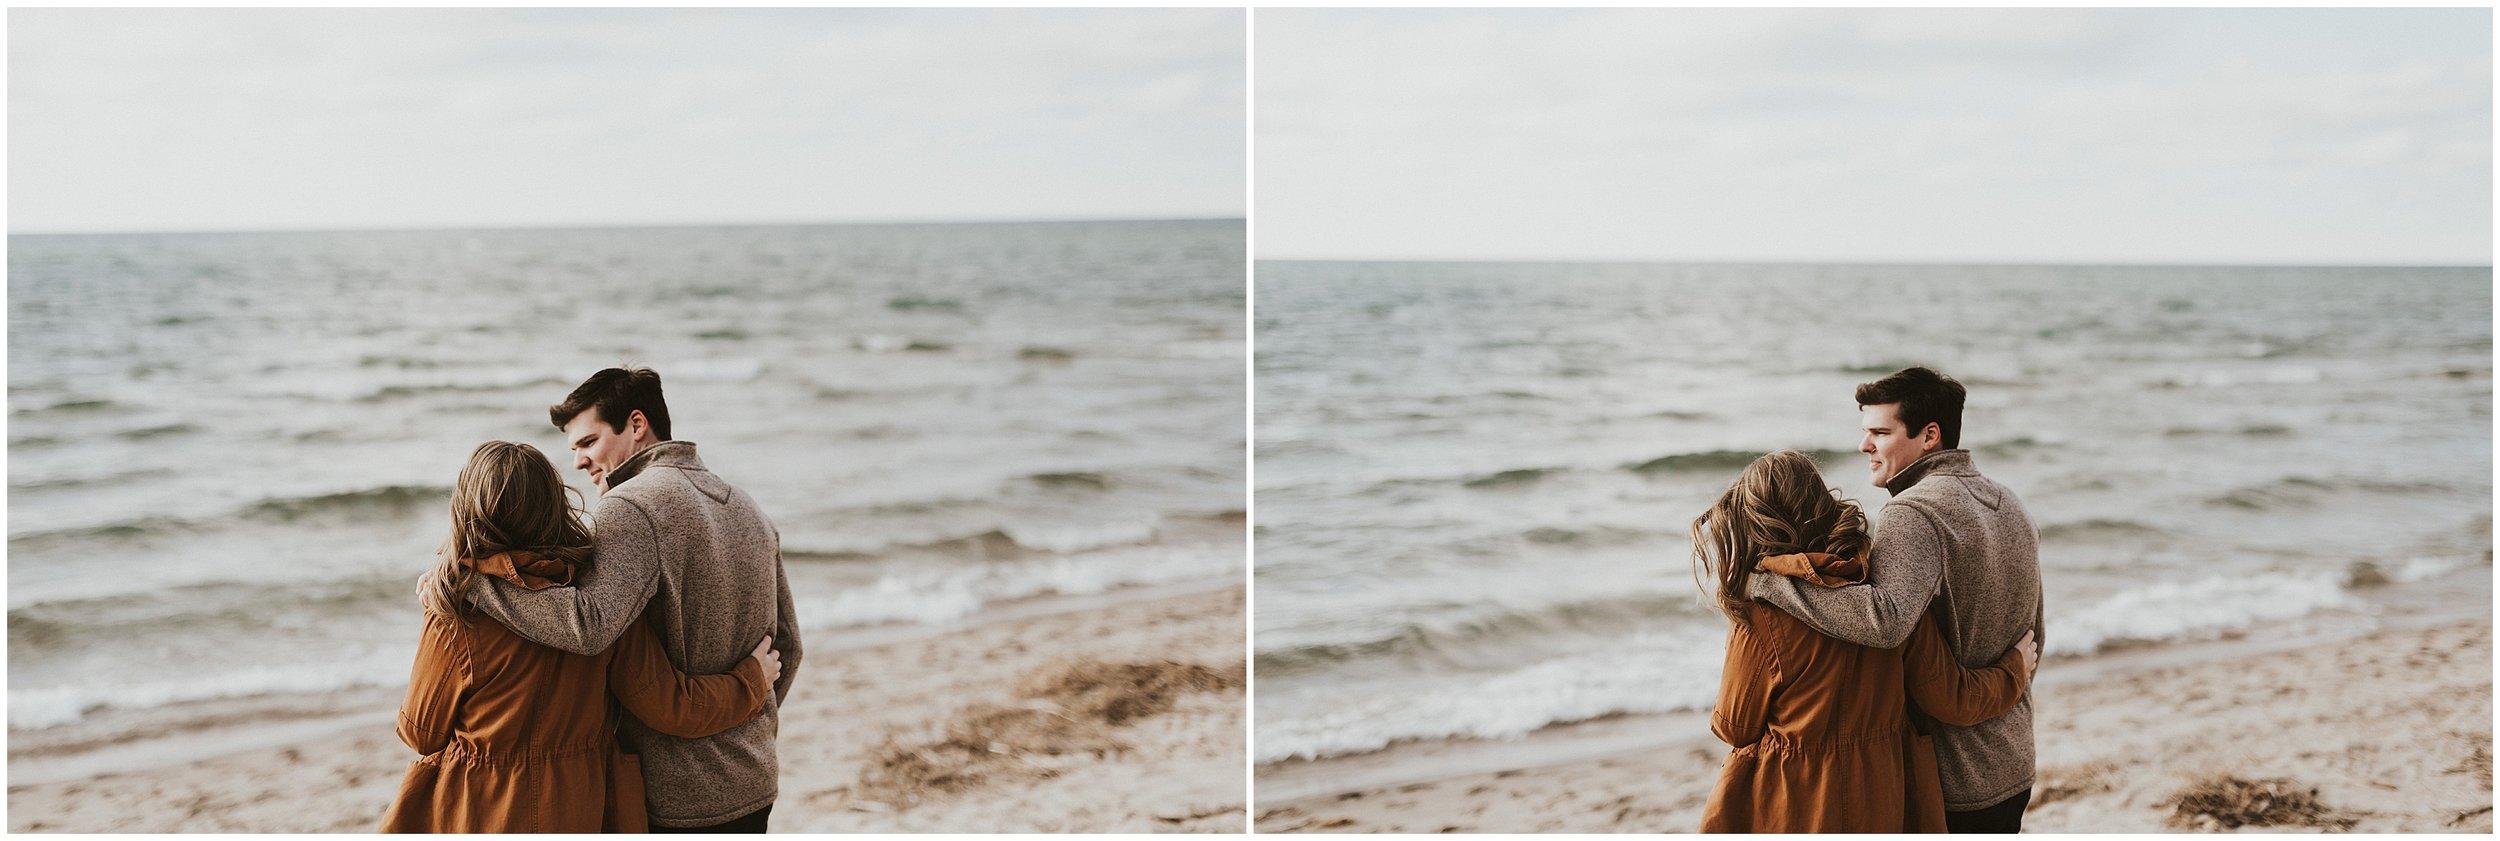 JAELYNNROSEPHOTOGRAPHY-8396.jpg